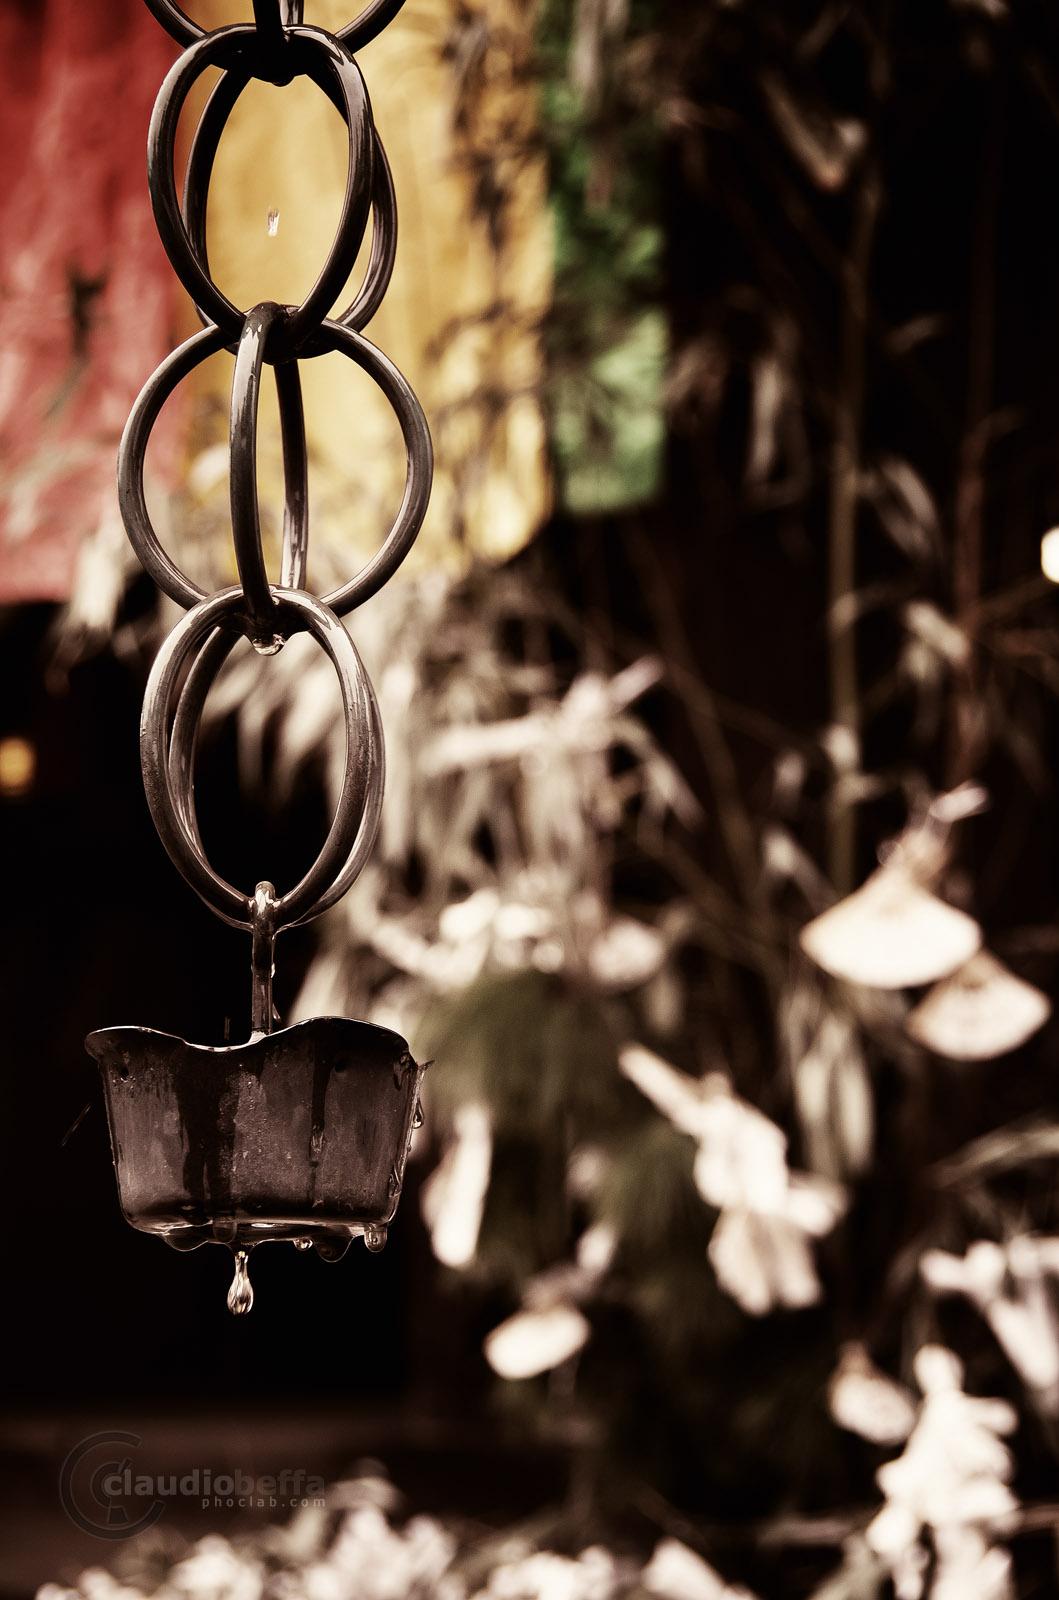 Water chain Kusaridoi rain drip temple Japan Pentax